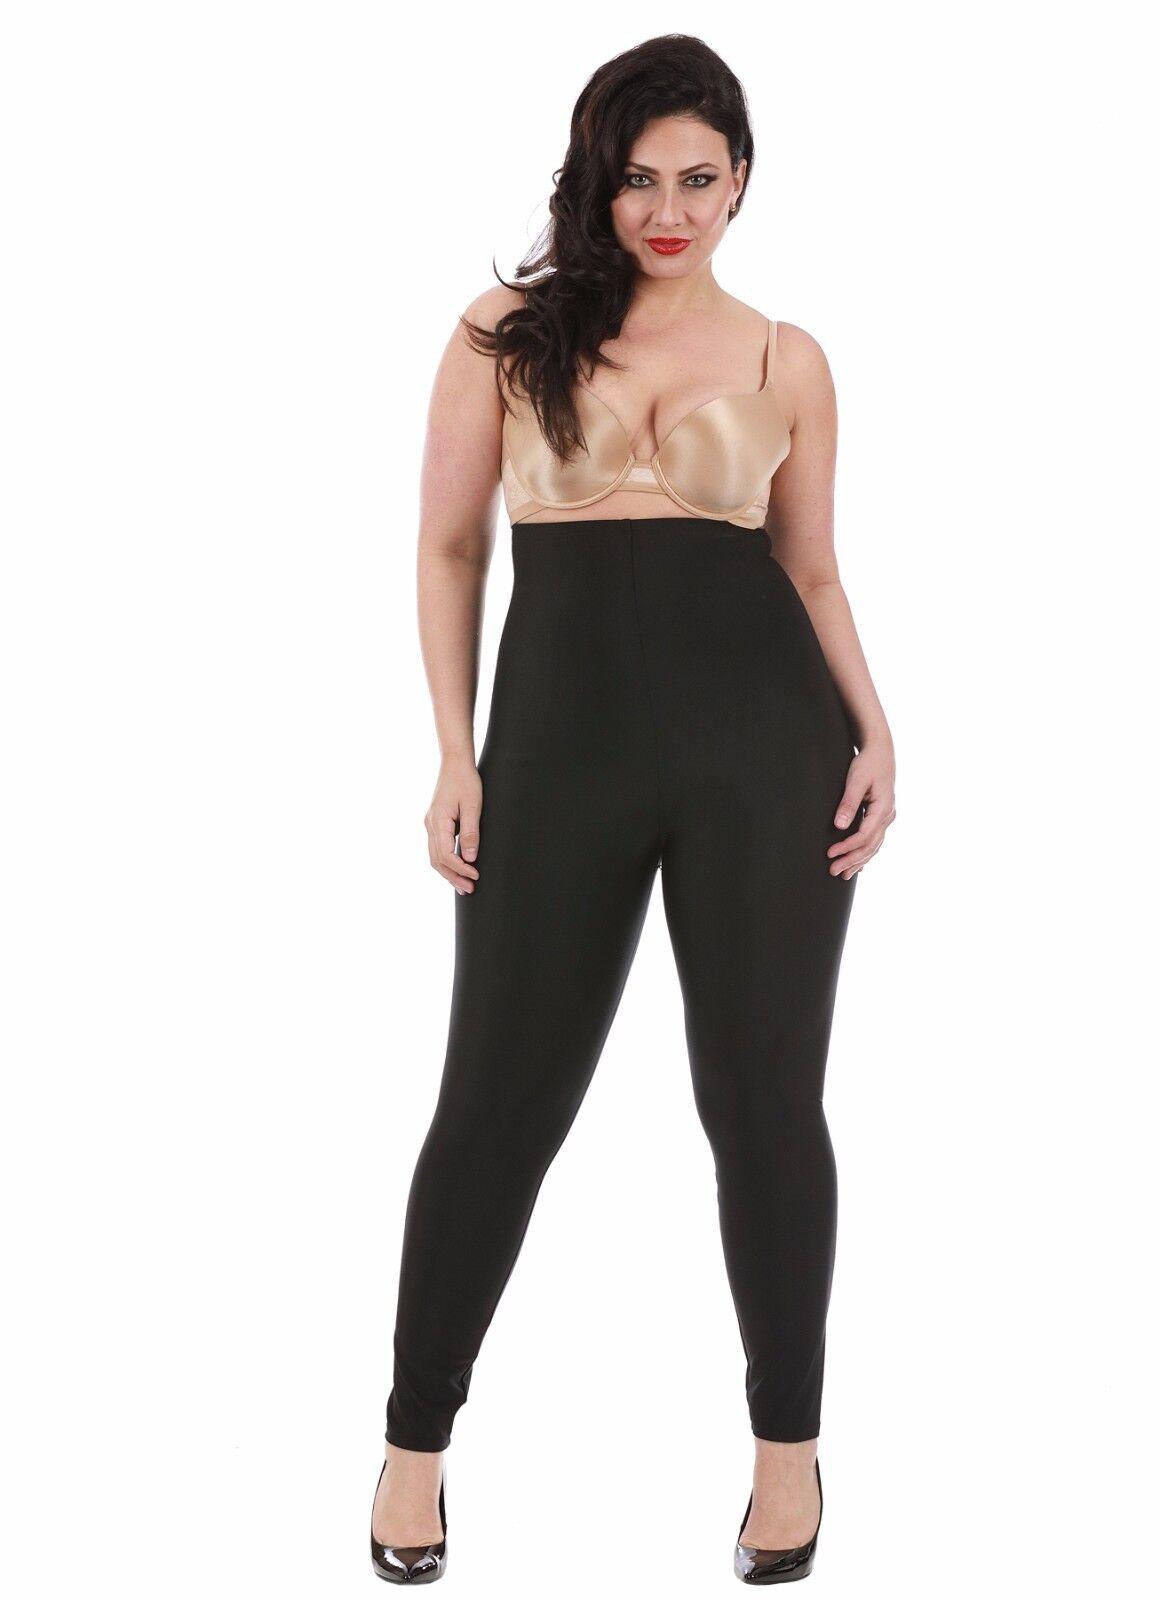 InstantFigure Hi-Waist Pants Curvy Shapewear